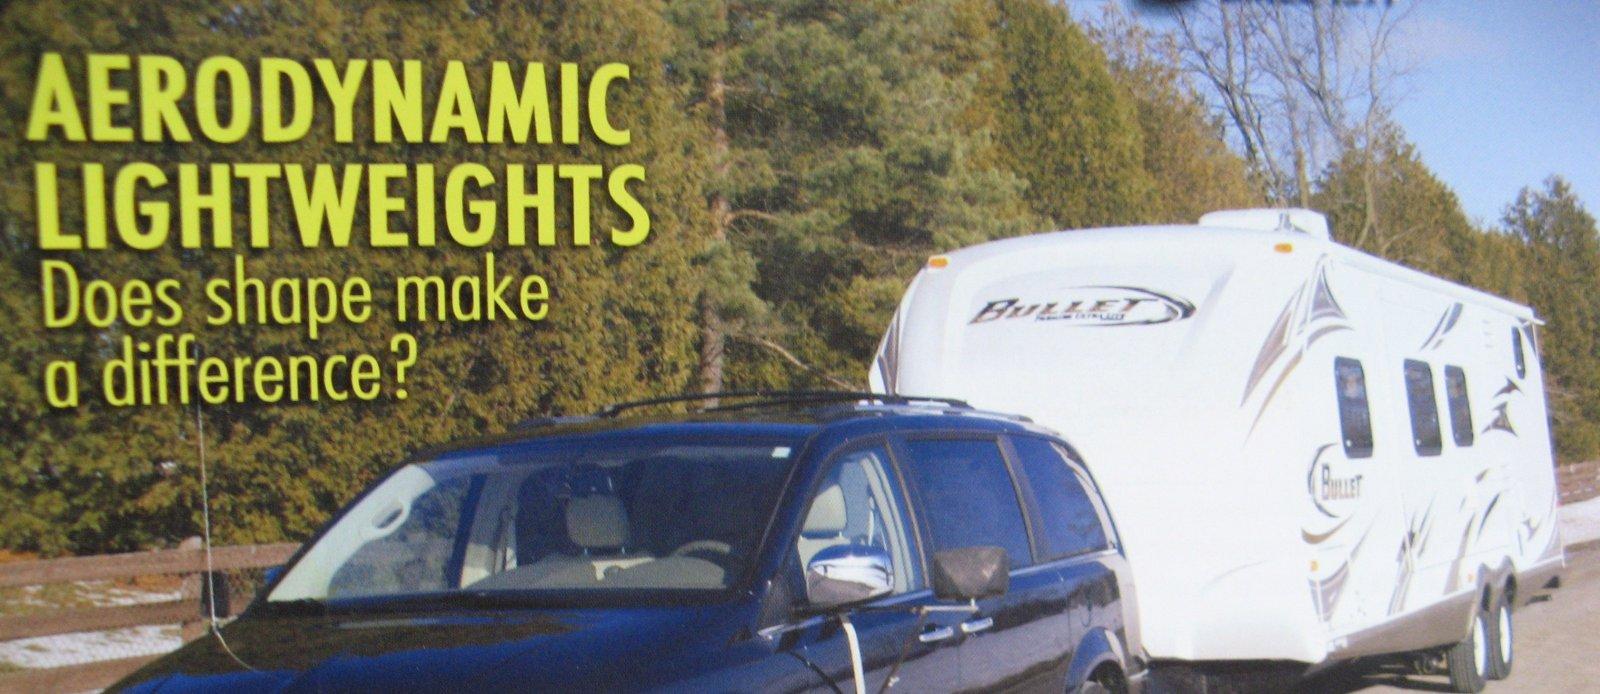 Click image for larger version  Name:dodge caravan - Copy.jpg Views:189 Size:201.3 KB ID:136368